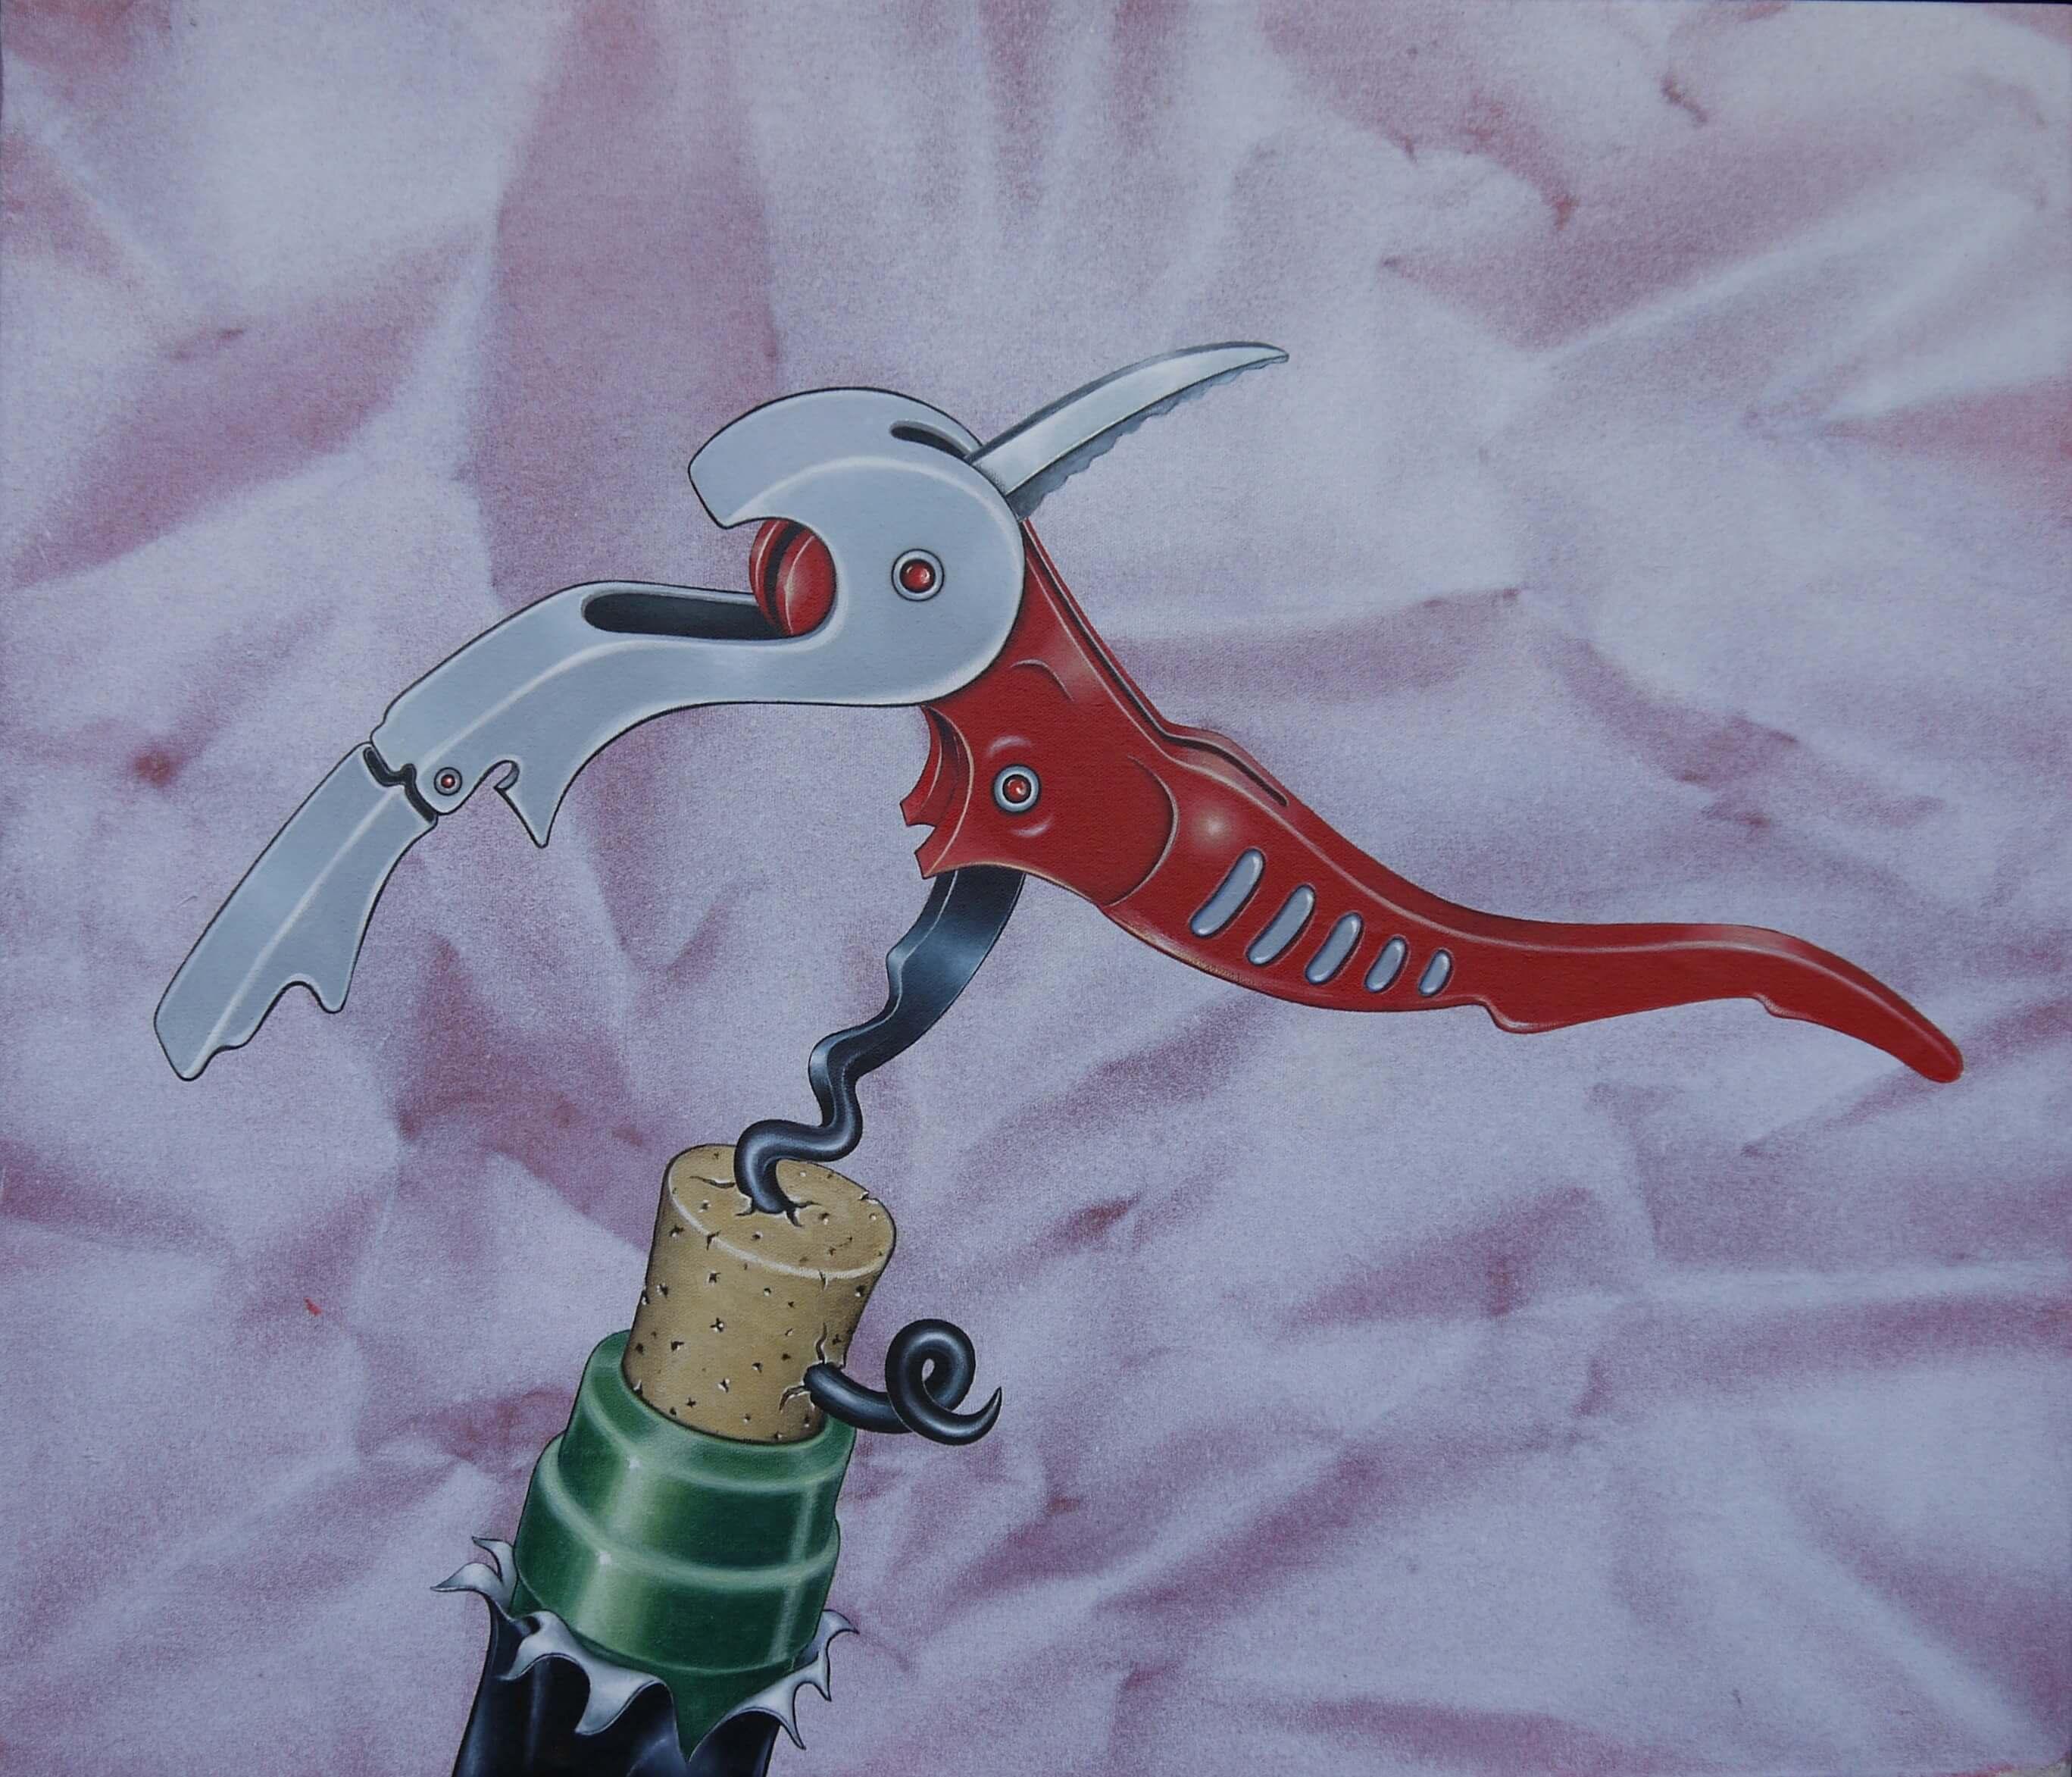 Bastian Raiss, Delirium Tremens, 2018, Acryl auf Leinwand, 77 x 89 cm